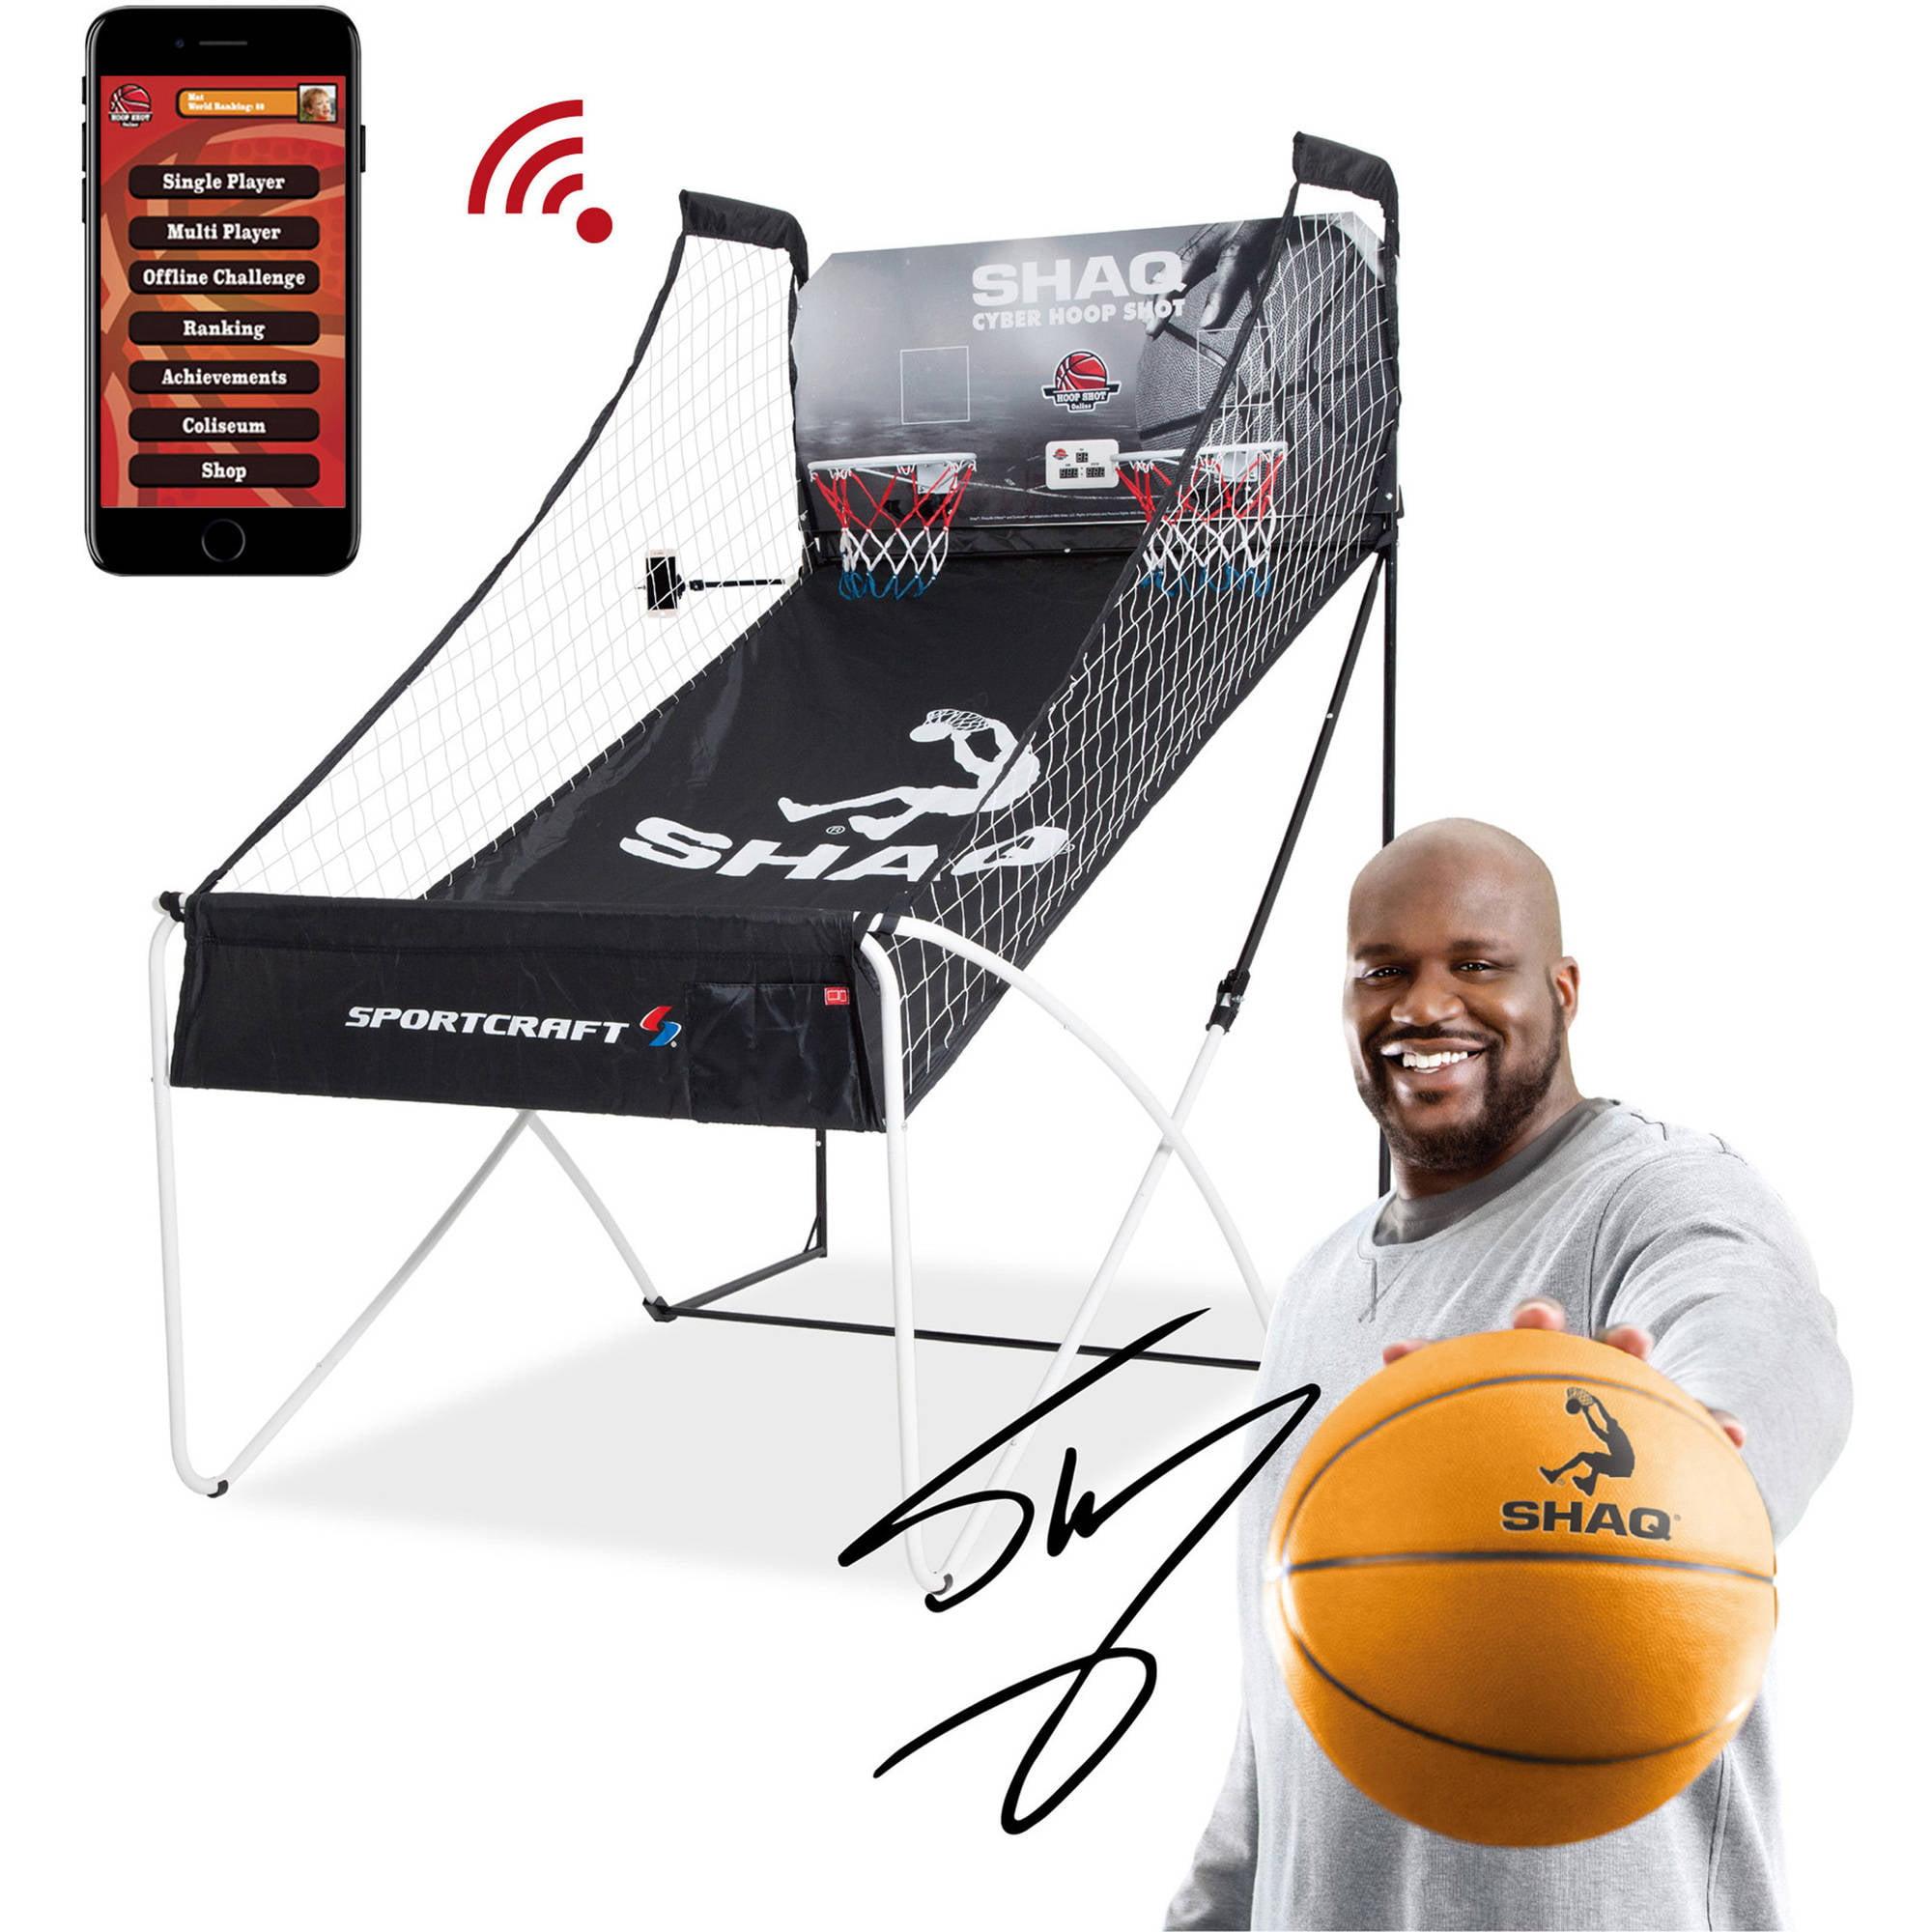 SHAQ Double Hoop Shot Basketball Arcade Conventional + Online App Game Sportcraft